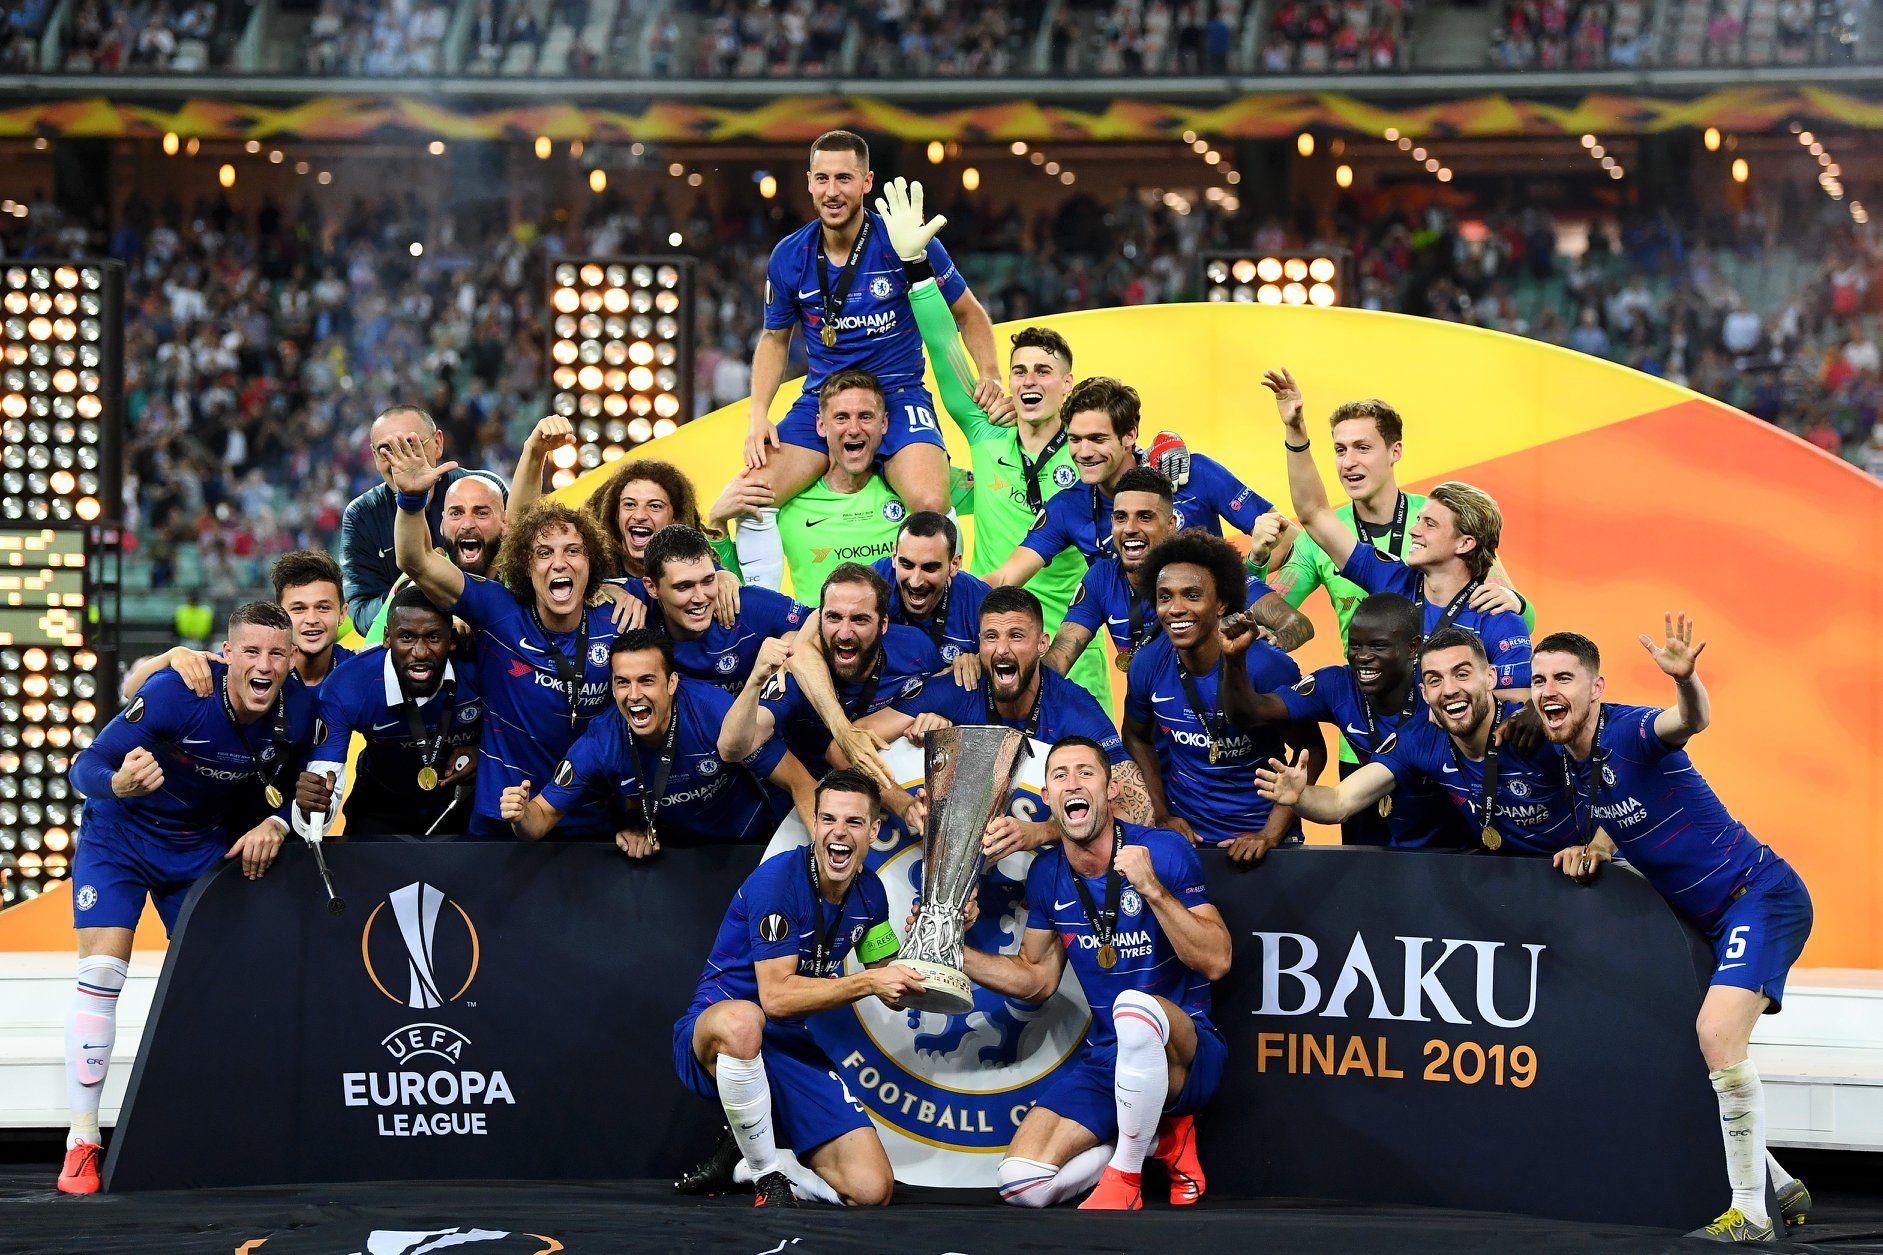 2018 19 Europa League Winners Europa League Chelsea Football Club Chelsea